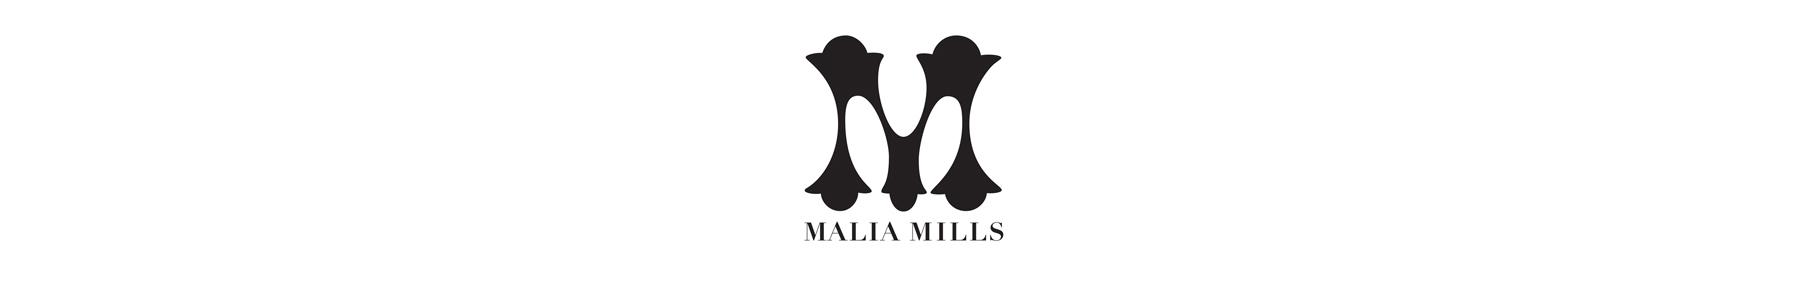 house of malia